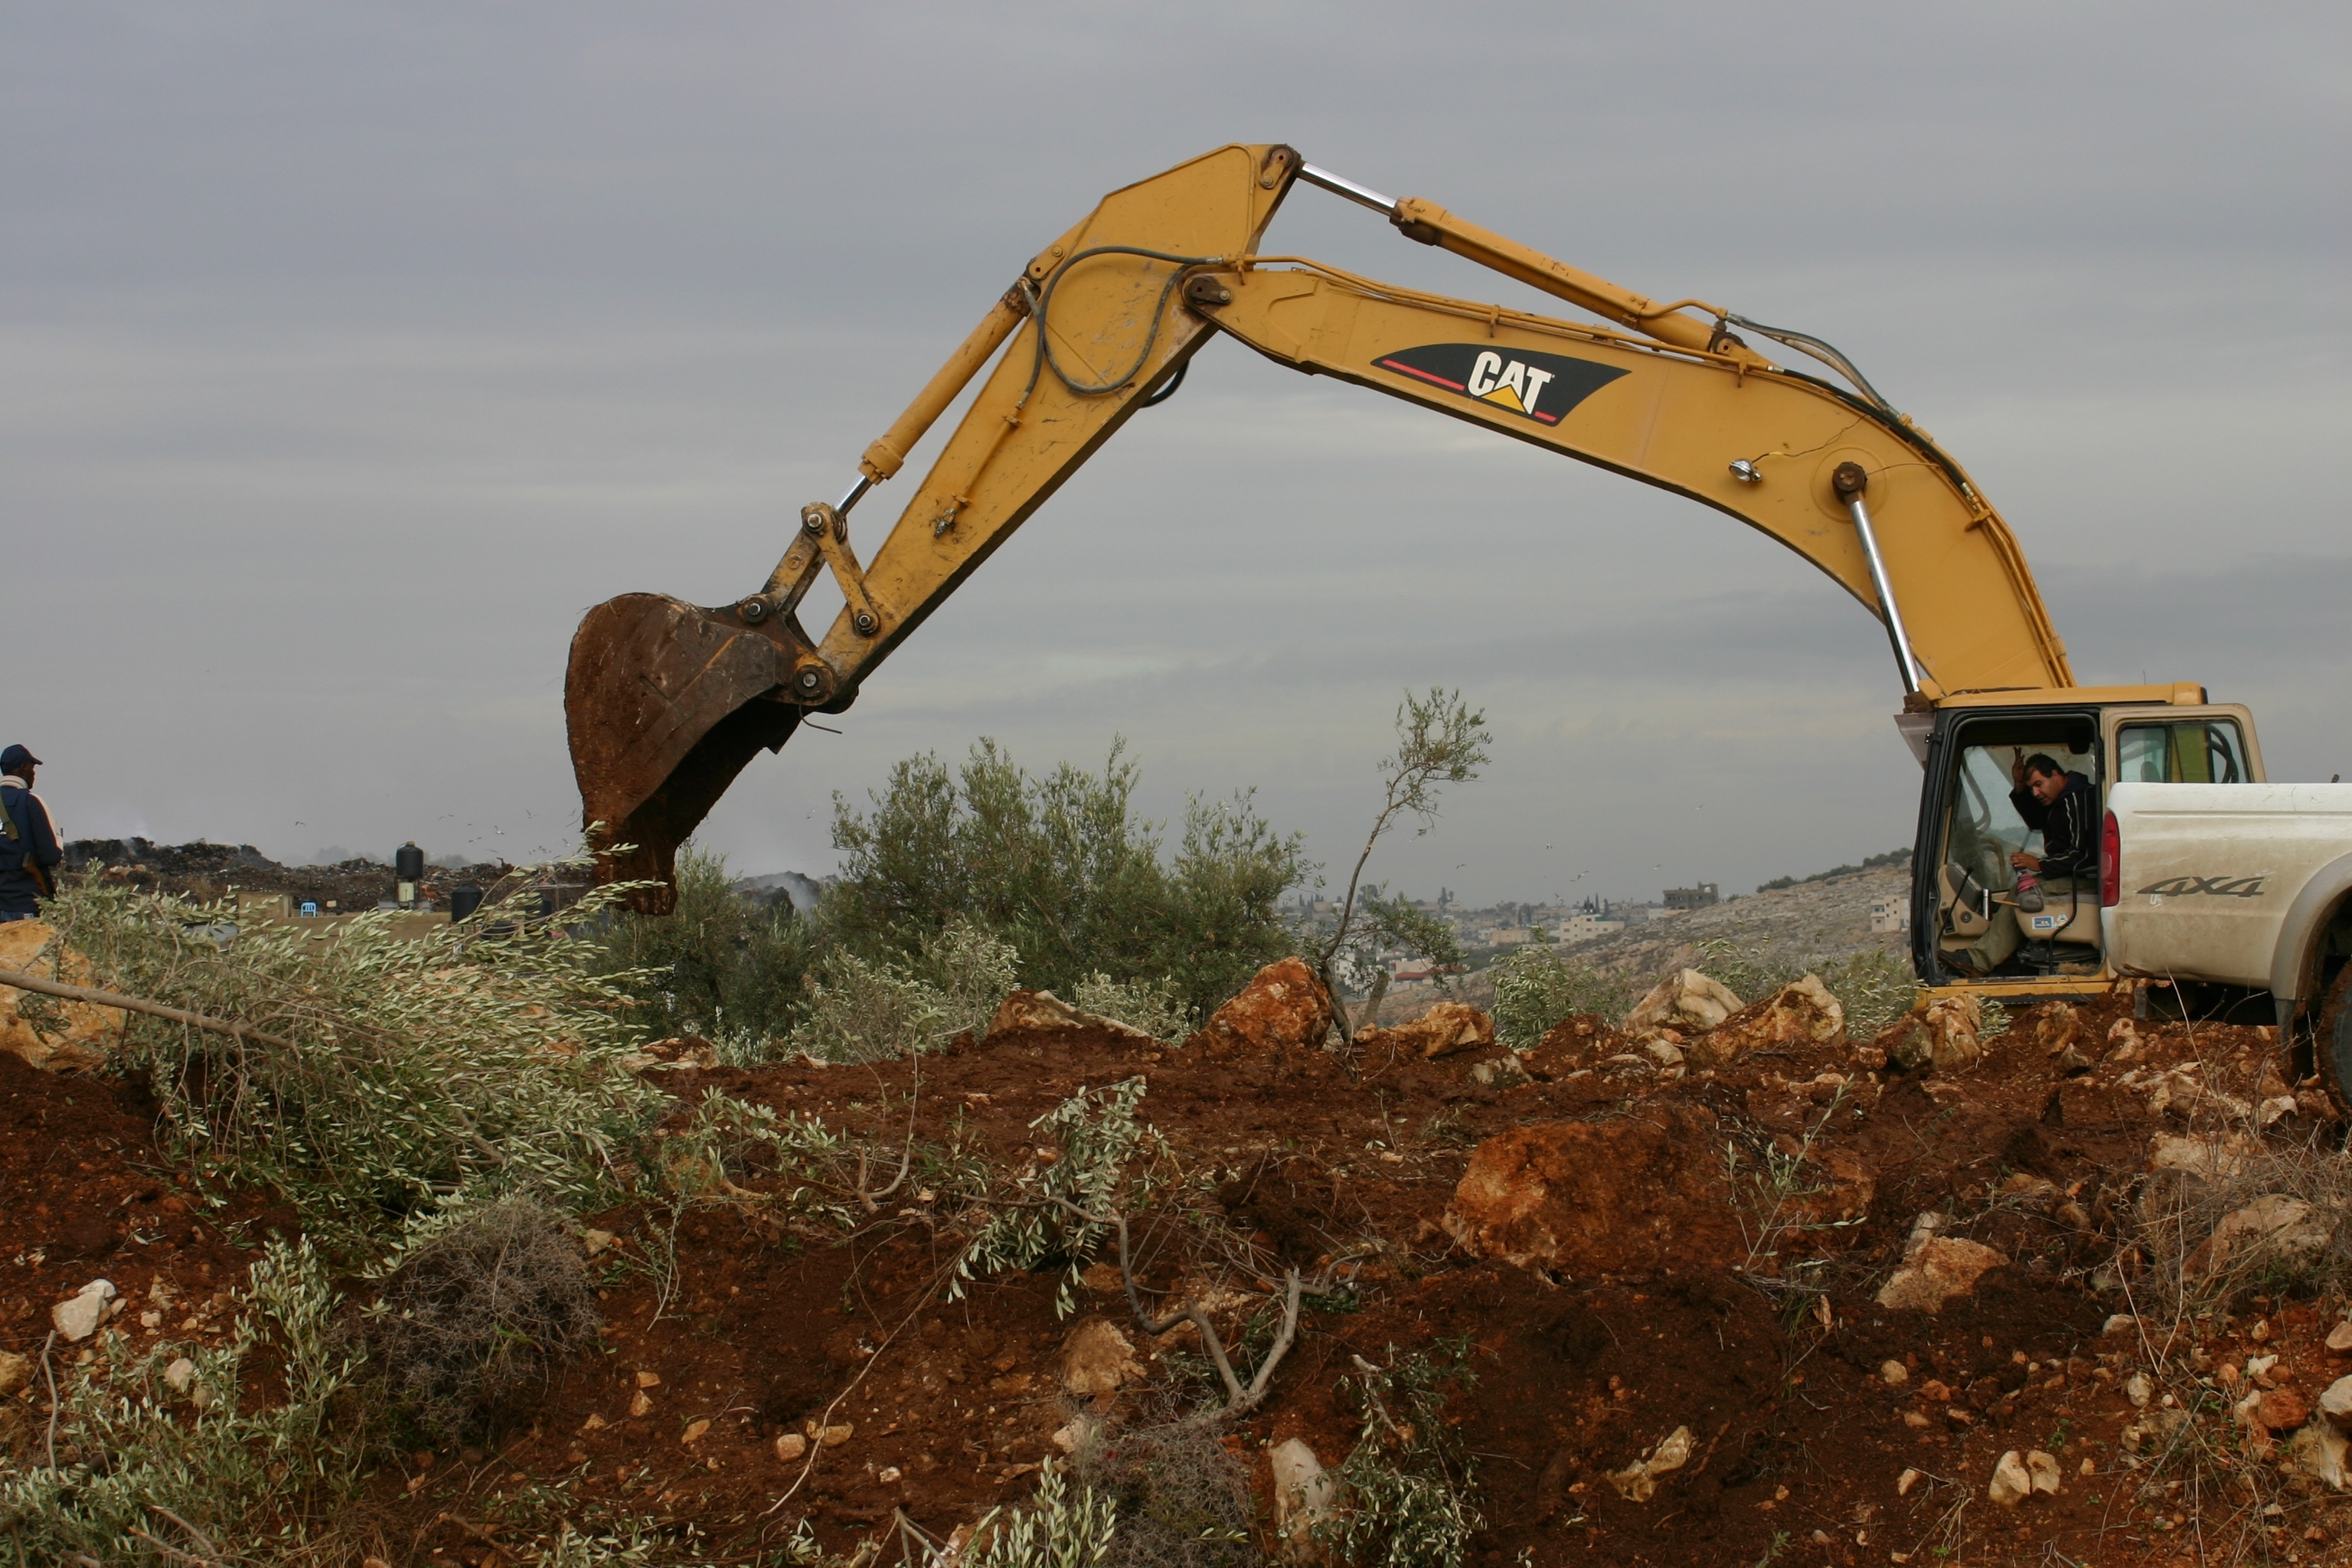 http://pages.ucsd.edu/~gfields/PalestinePhotos/uprootingtreesjabara.2.jpg